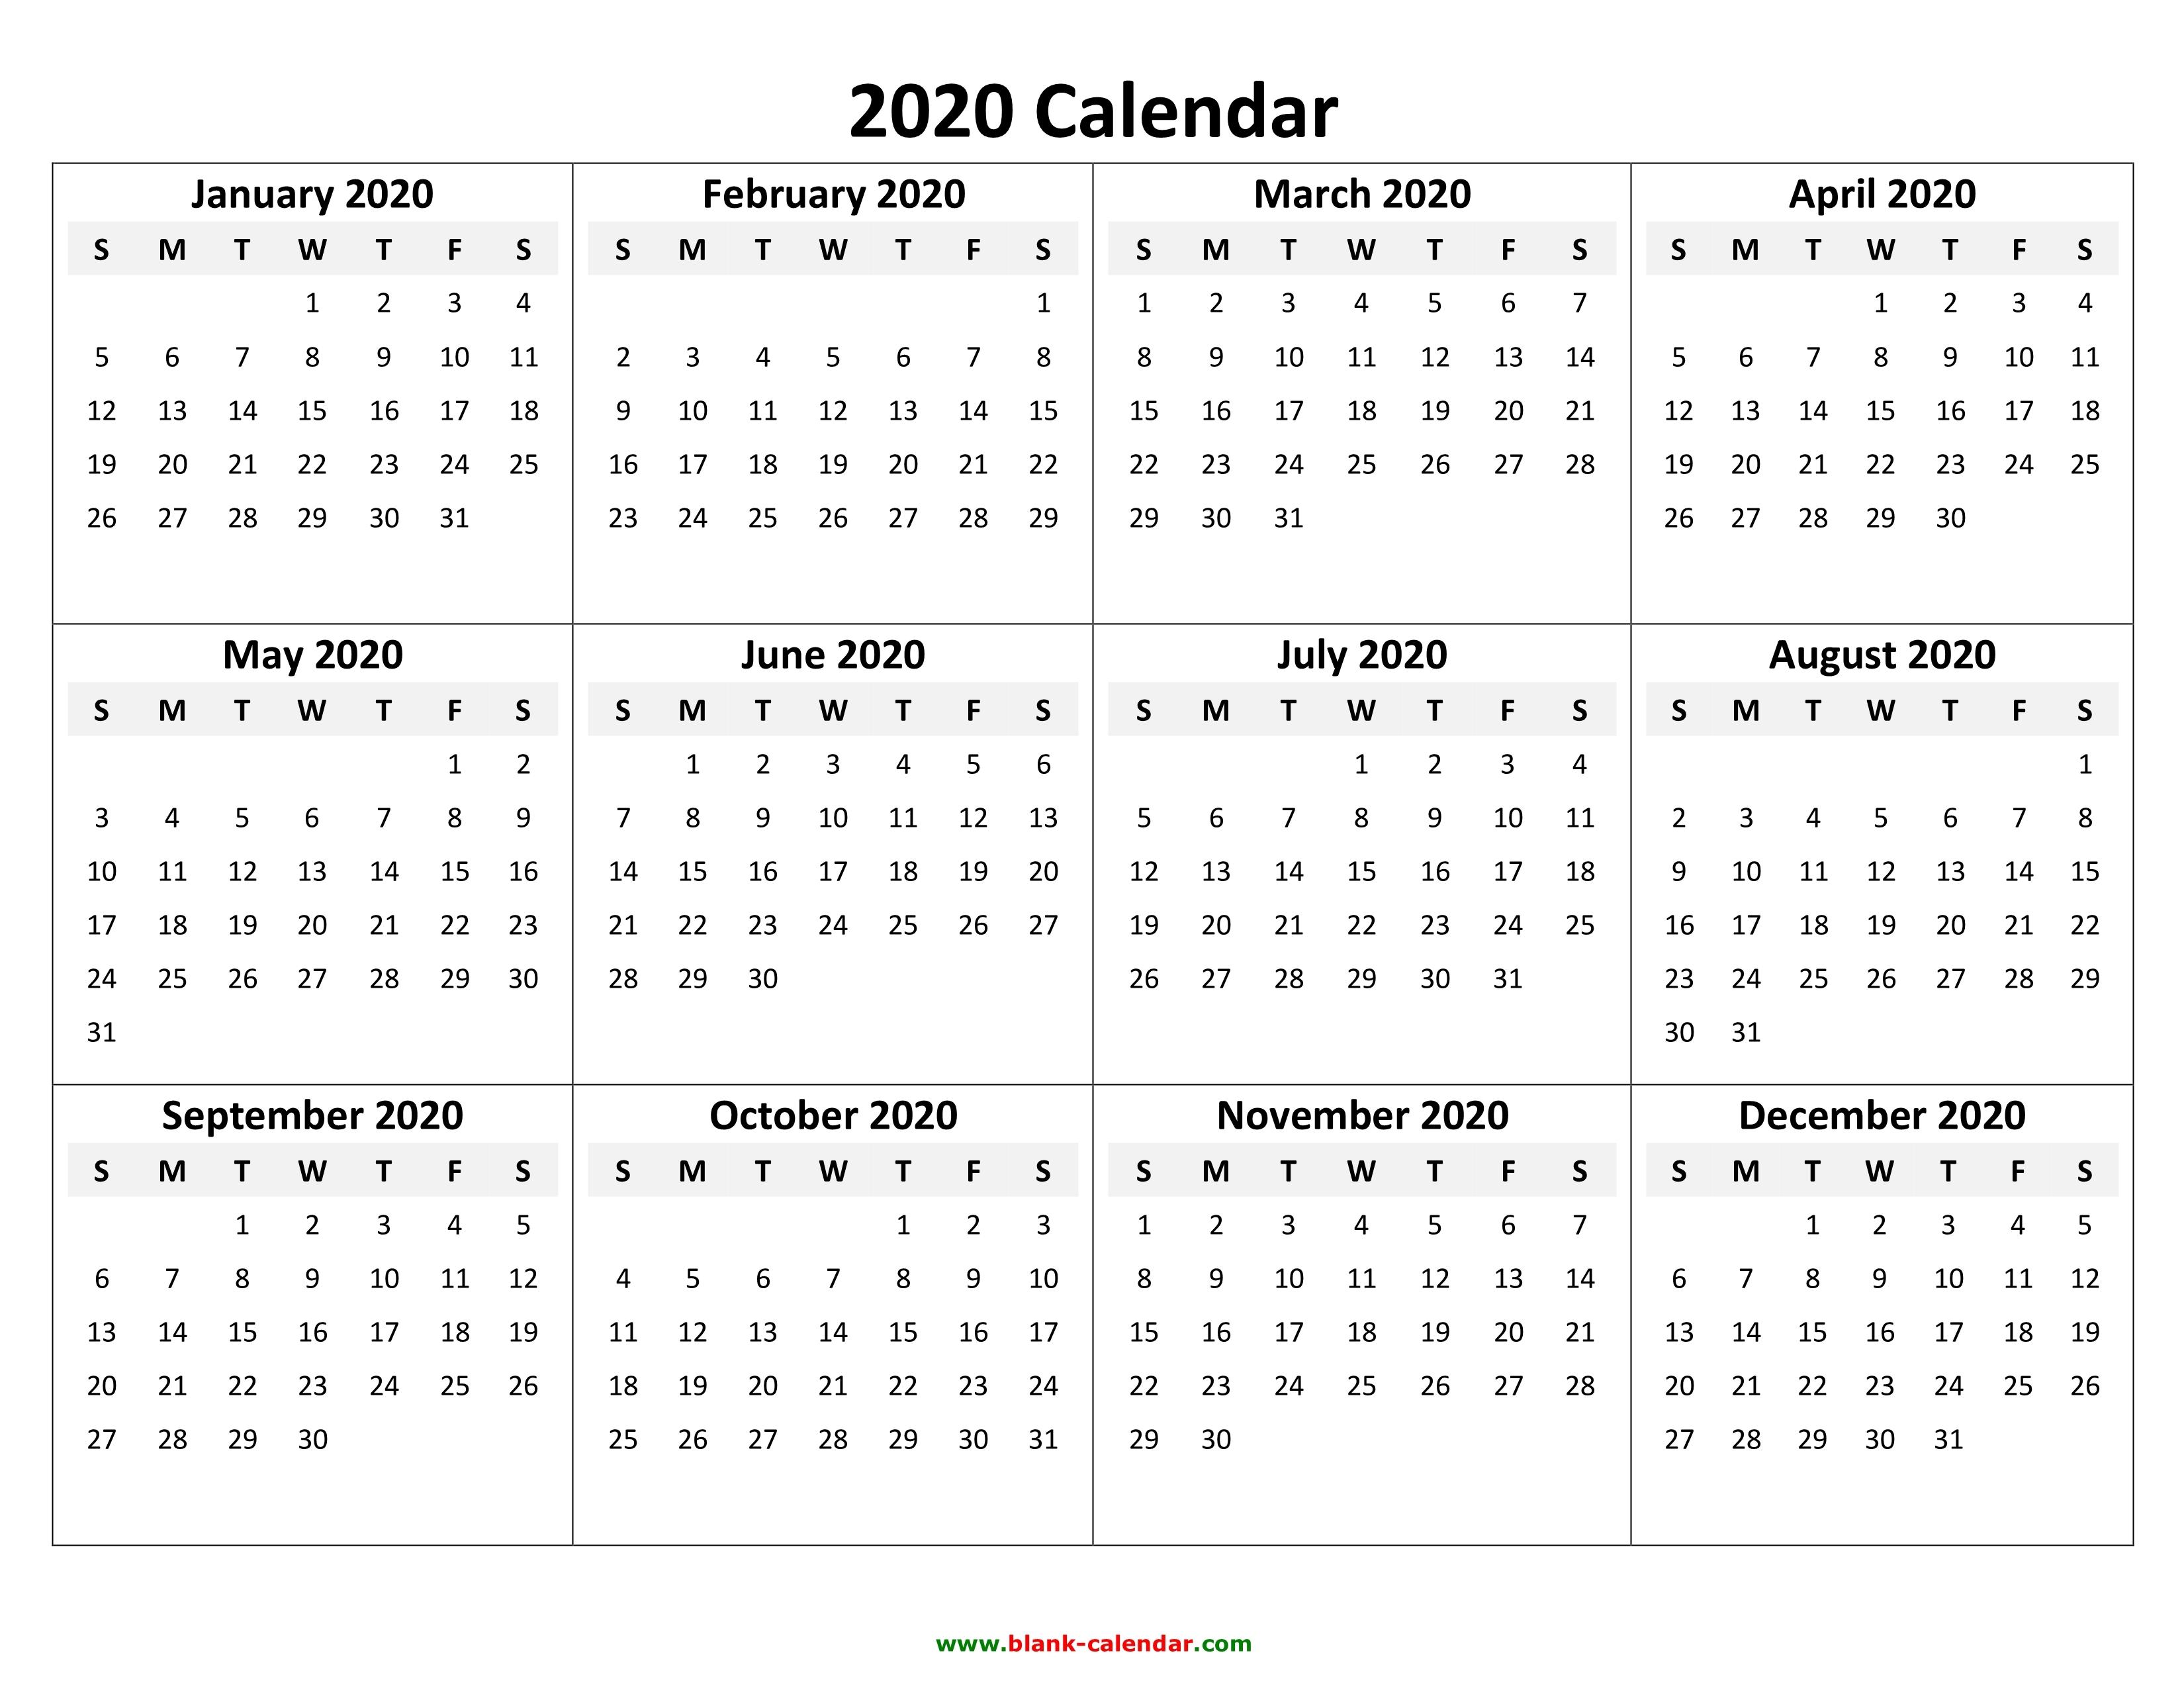 2020 2020 Calendar Printable | Isacl